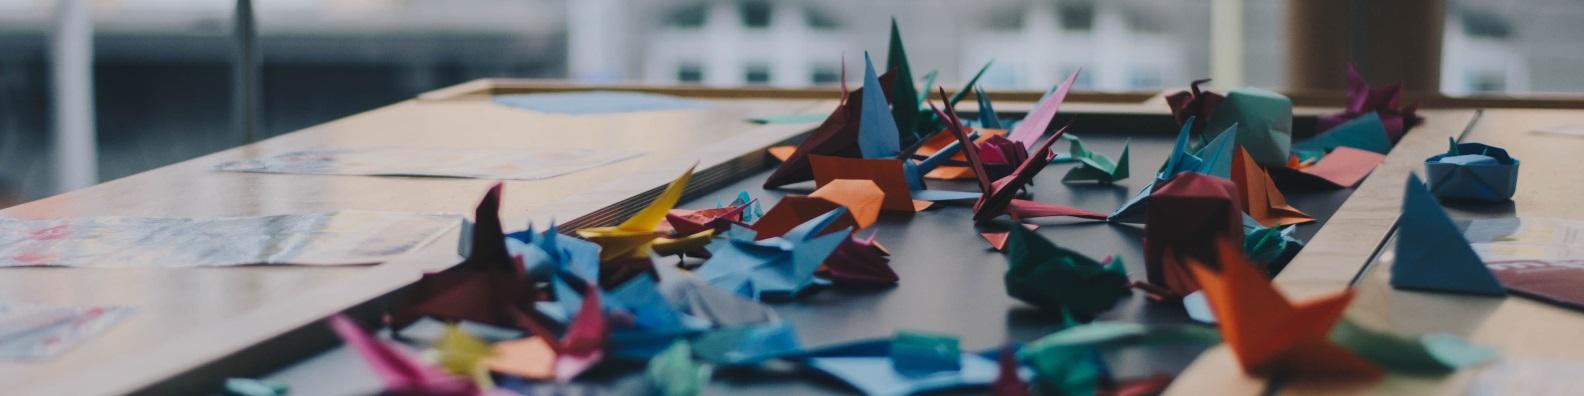 Selection of origami cranes, cropped photo byDevonUnsplash